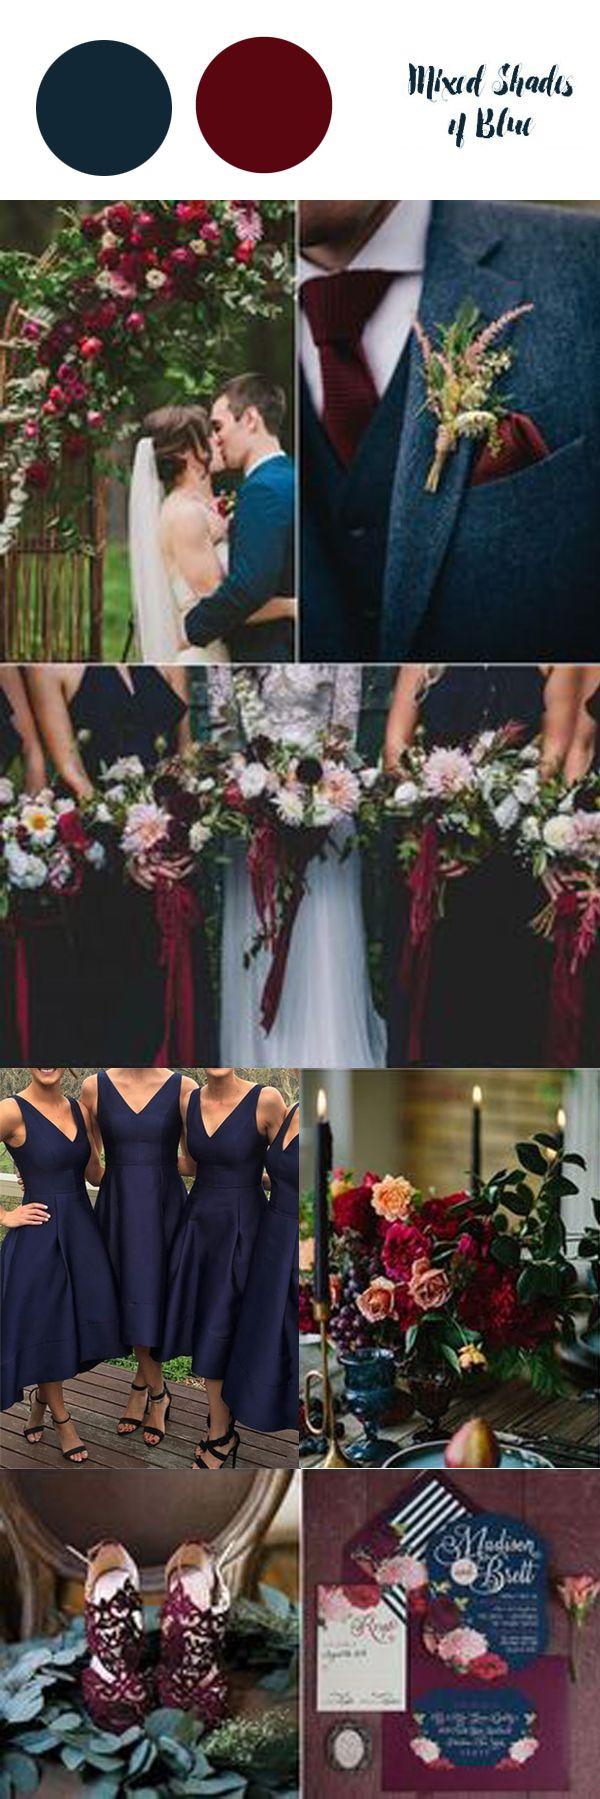 Navy blue with burgendy  #wedding #bridal #weddingdress #bridesmaid #weddingshoes